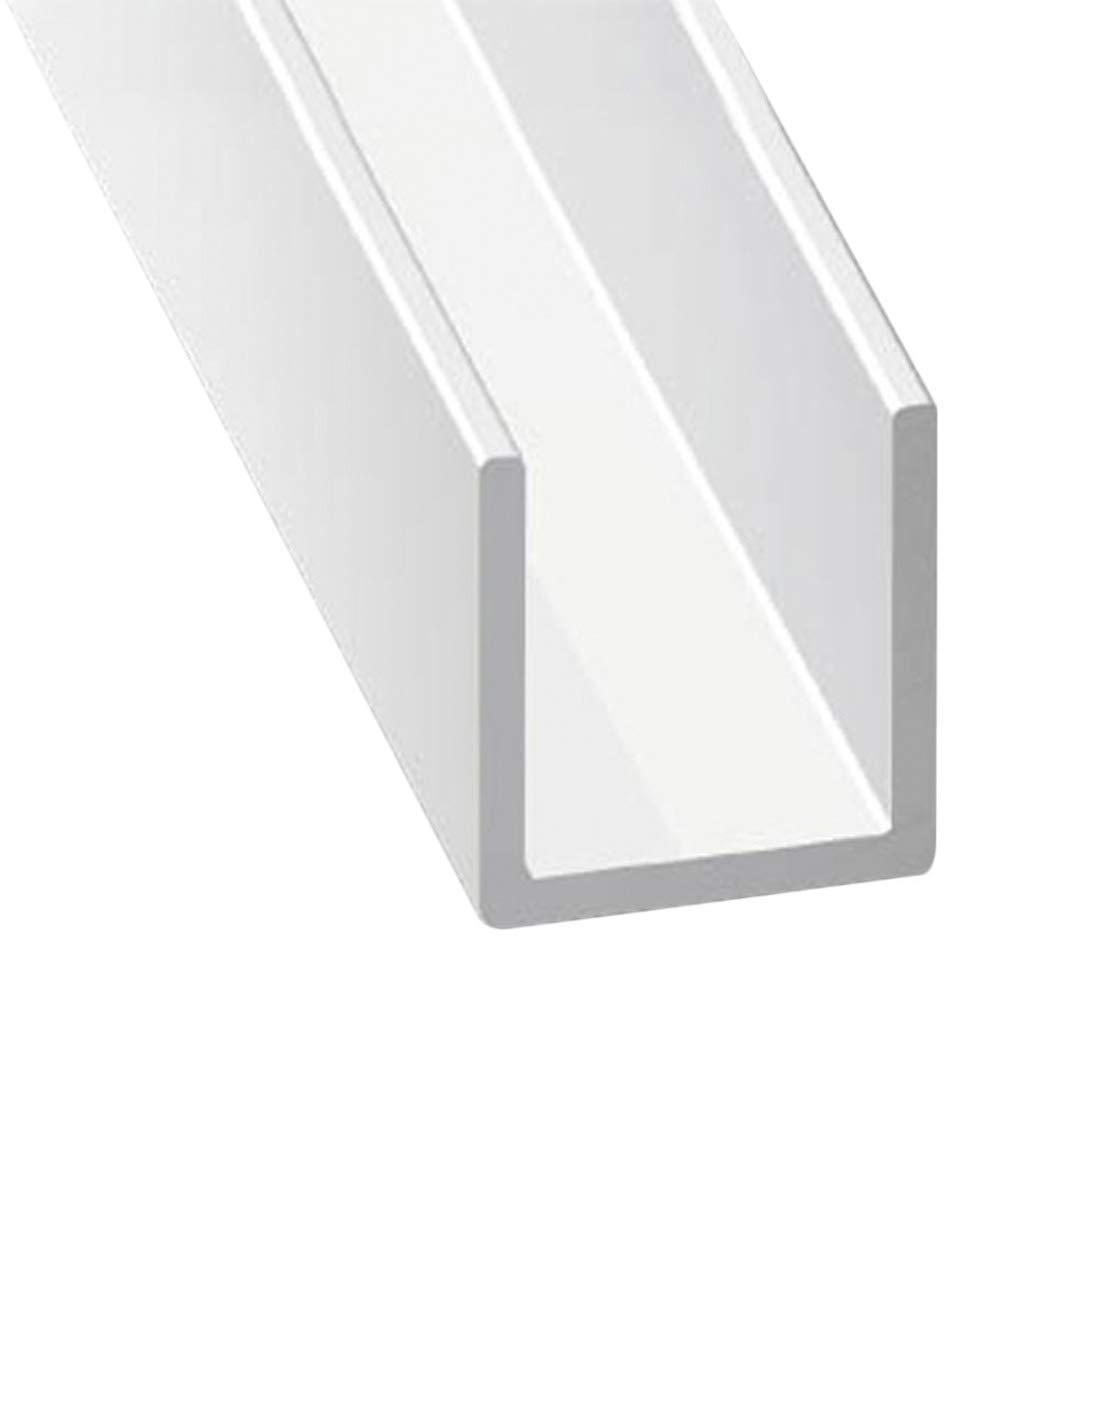 210m Jardin202 Perfil de Aluminio Blanco en U x3 unds